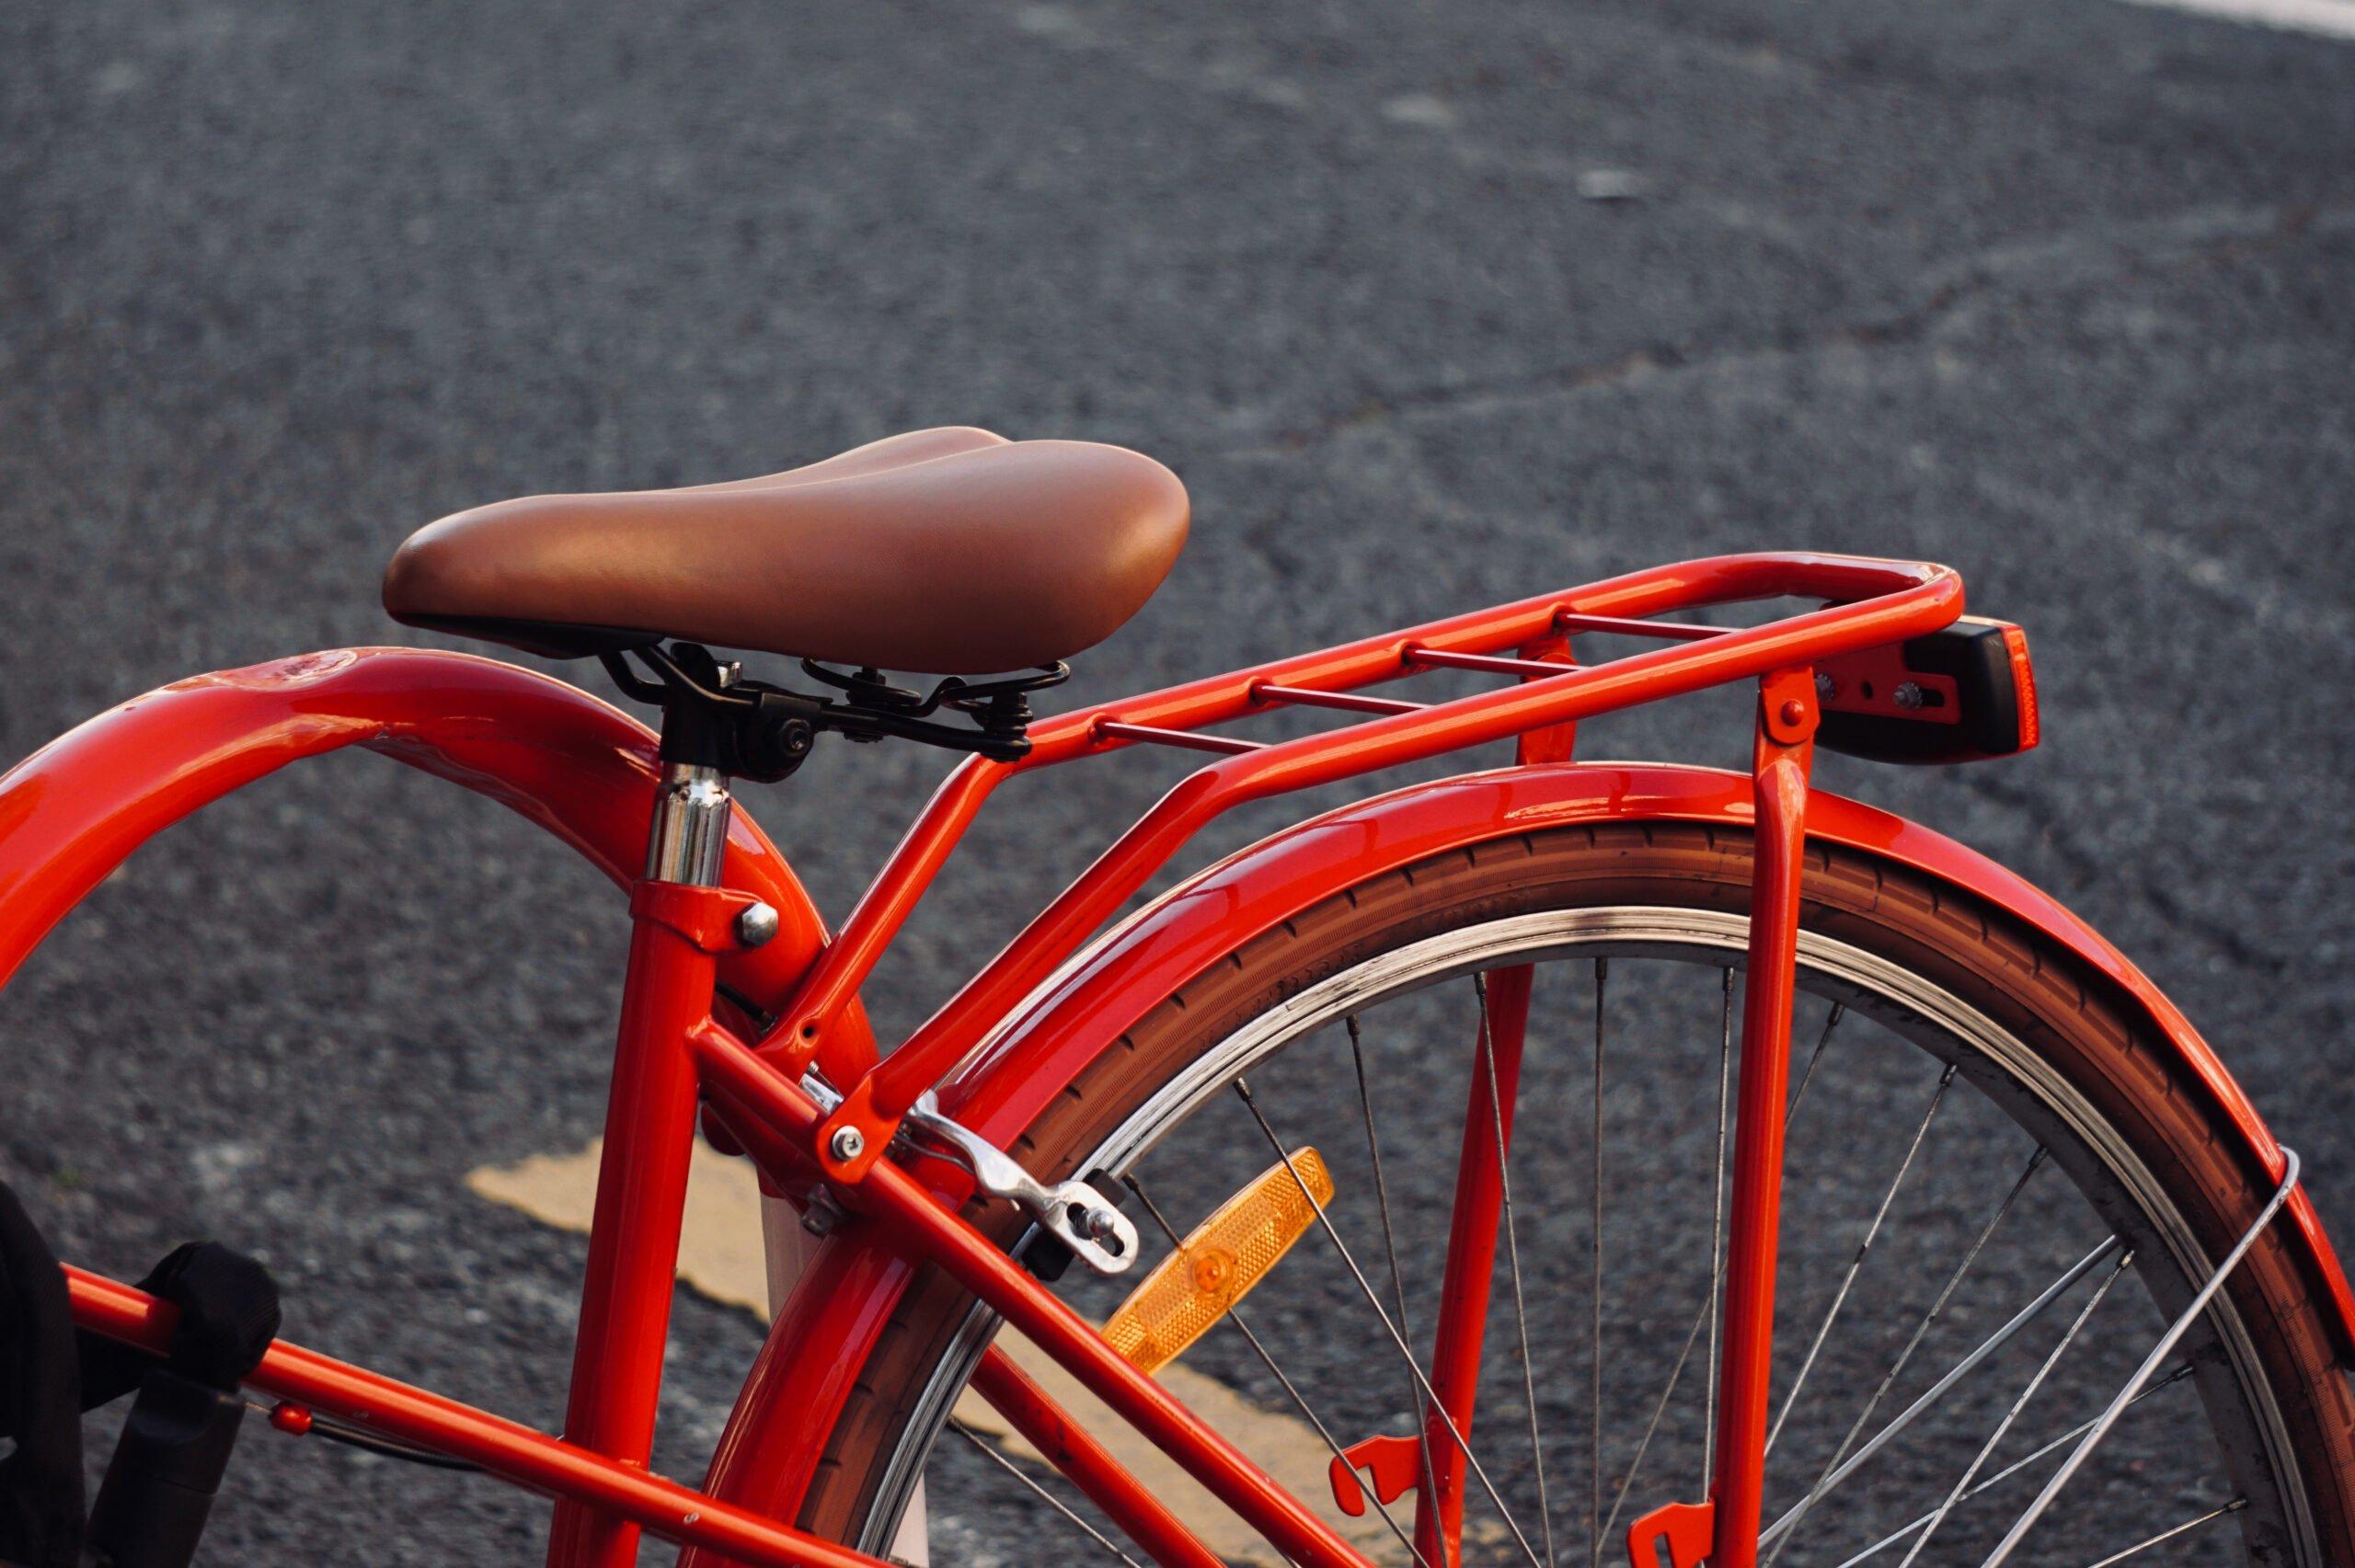 Take Your Bike And Join Us To The Bilbao Bike Tour